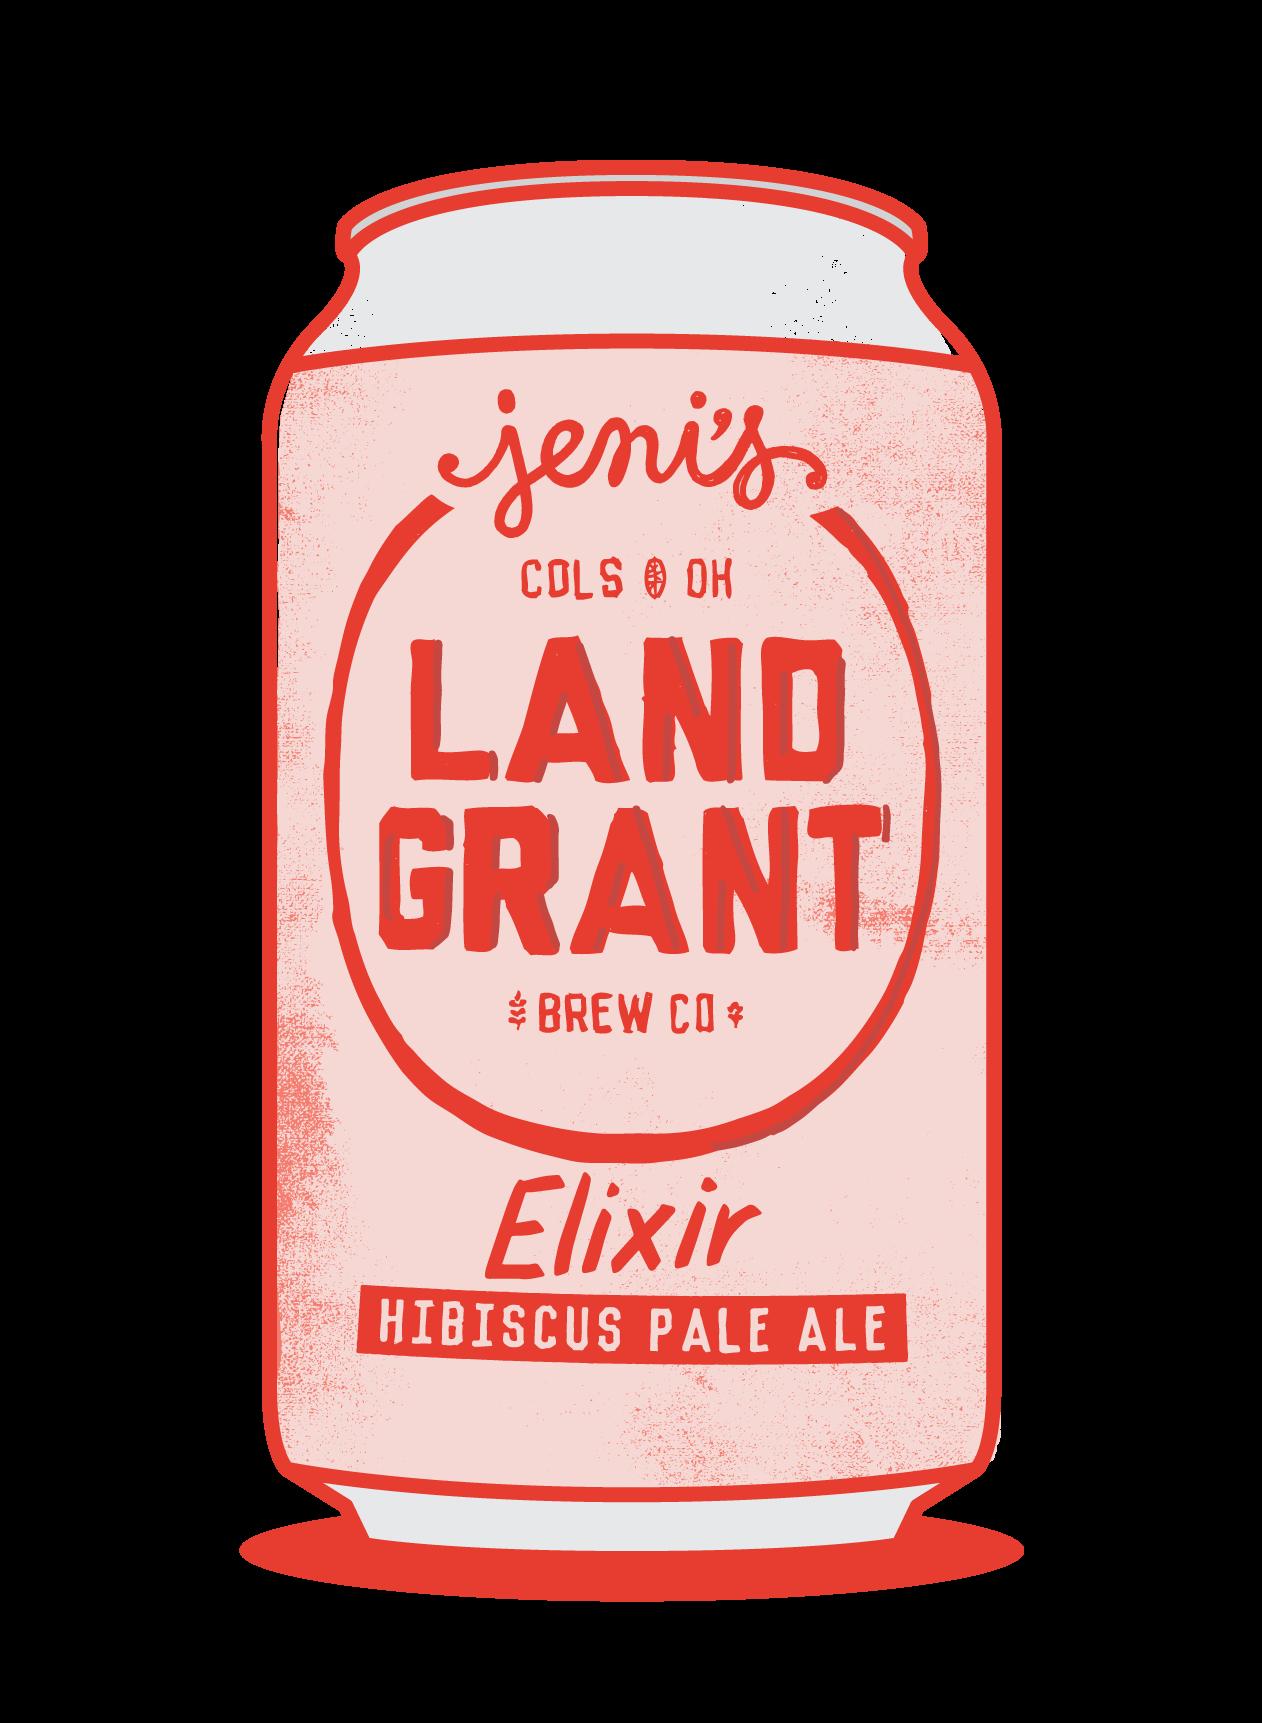 Jenis - Elixir Image